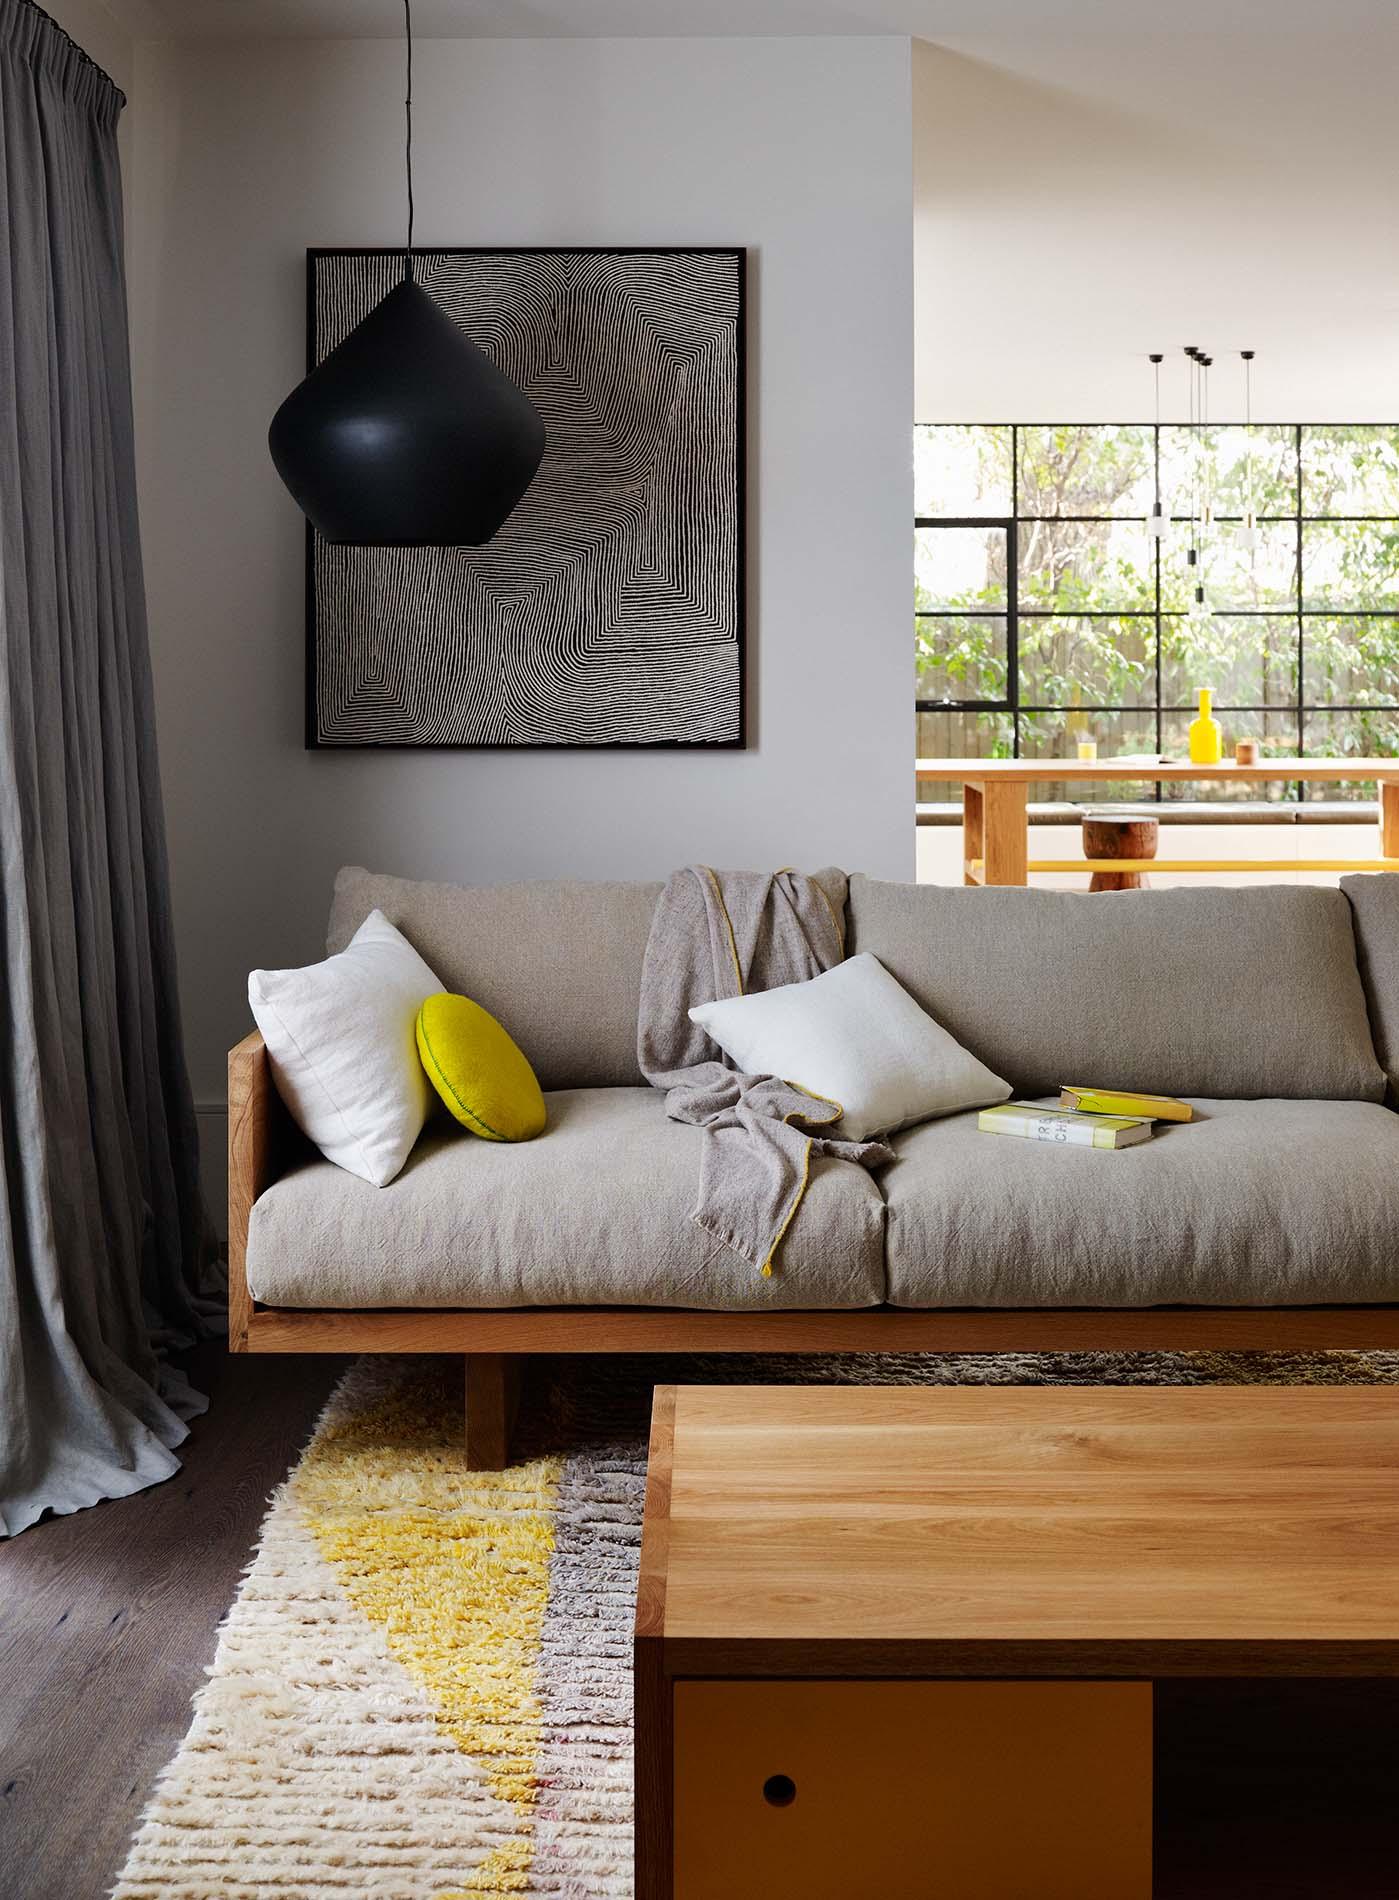 style by emily henderson, emily henderson, emily henderson tips, 2016 living room trends